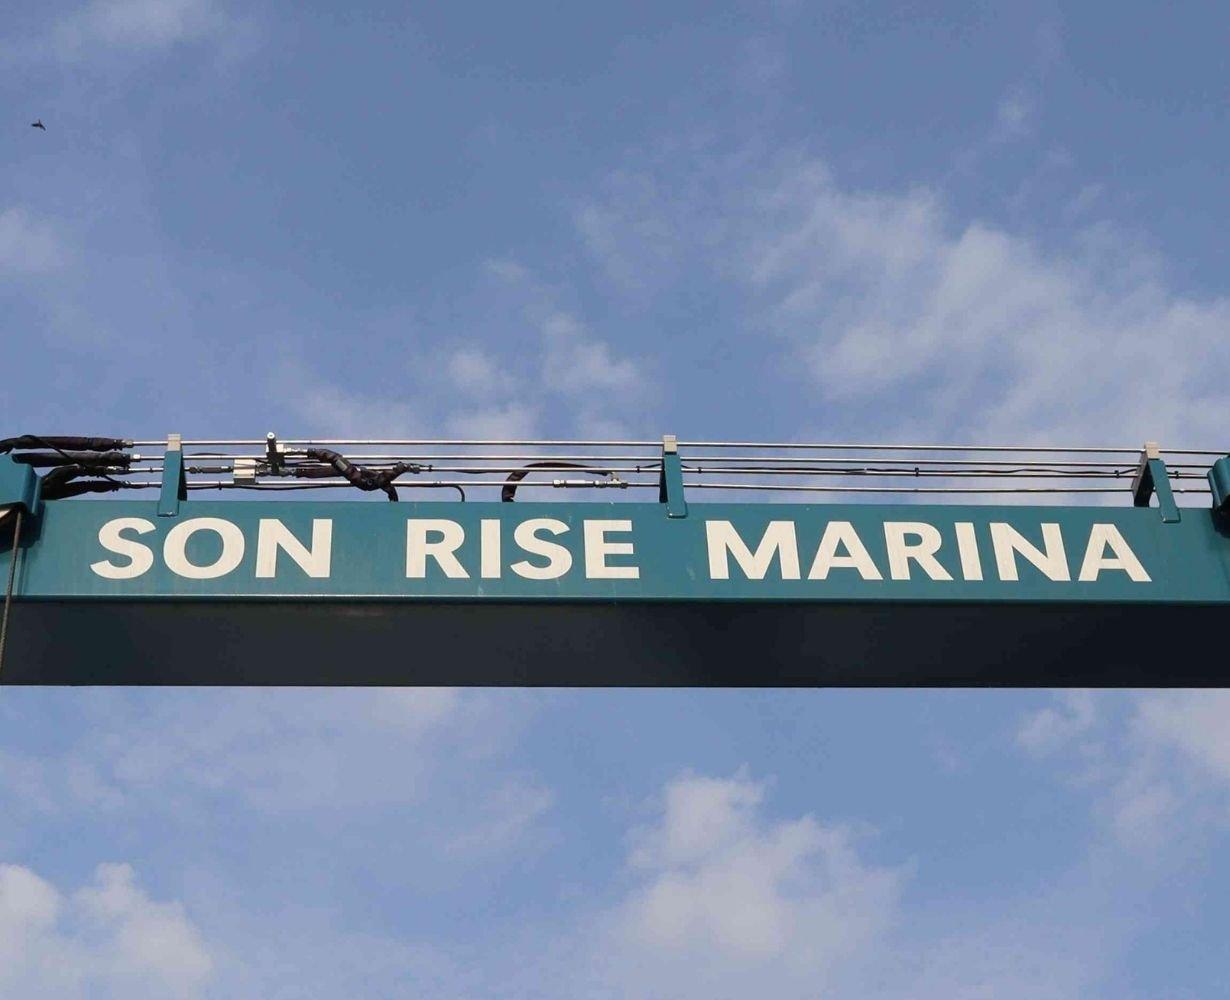 son-rise-marina-sandusky-ohio-gallery-storage-5